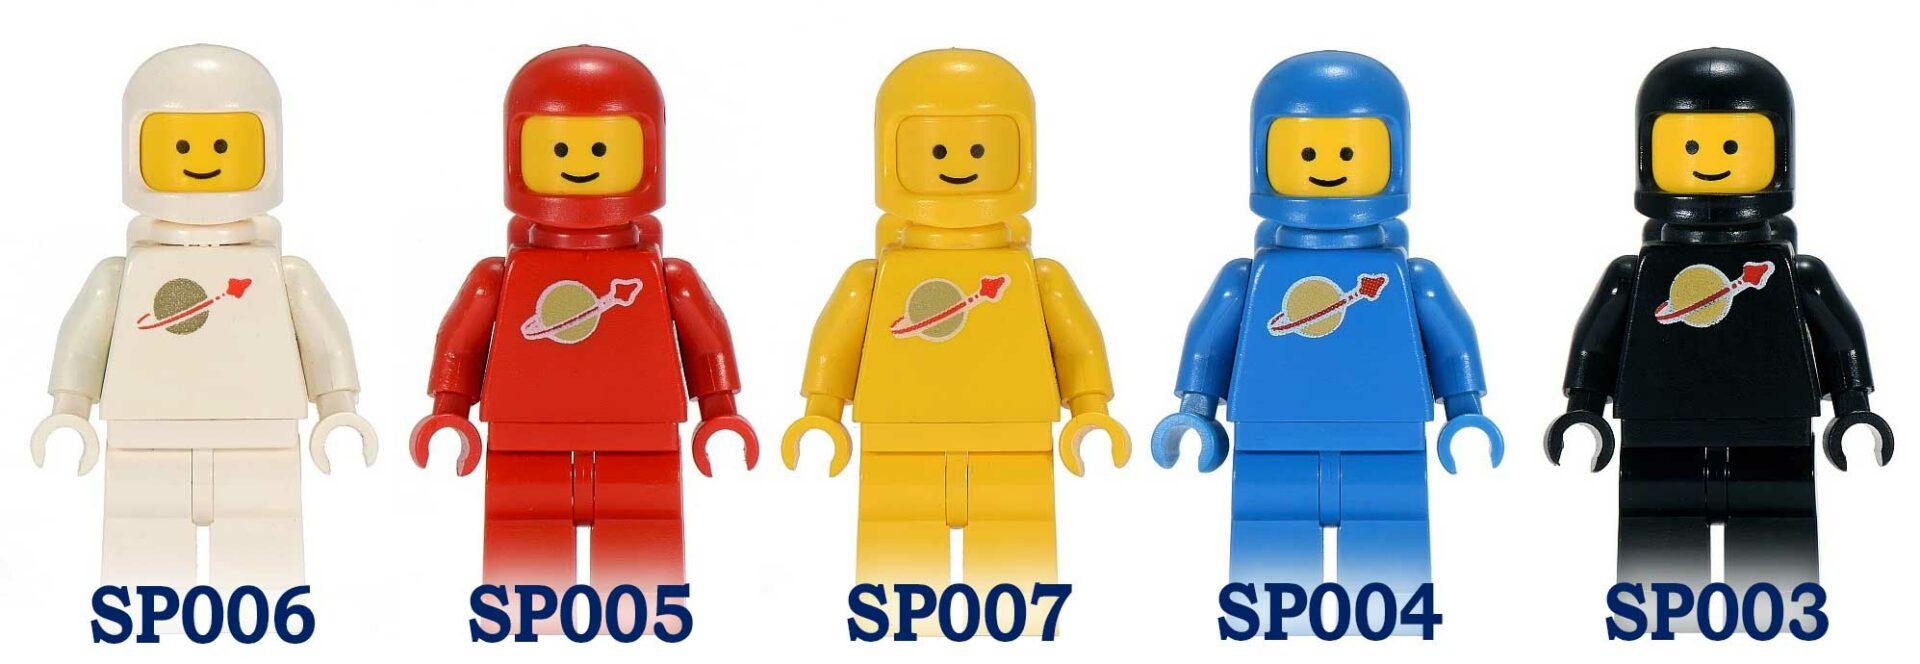 Space minifigurer